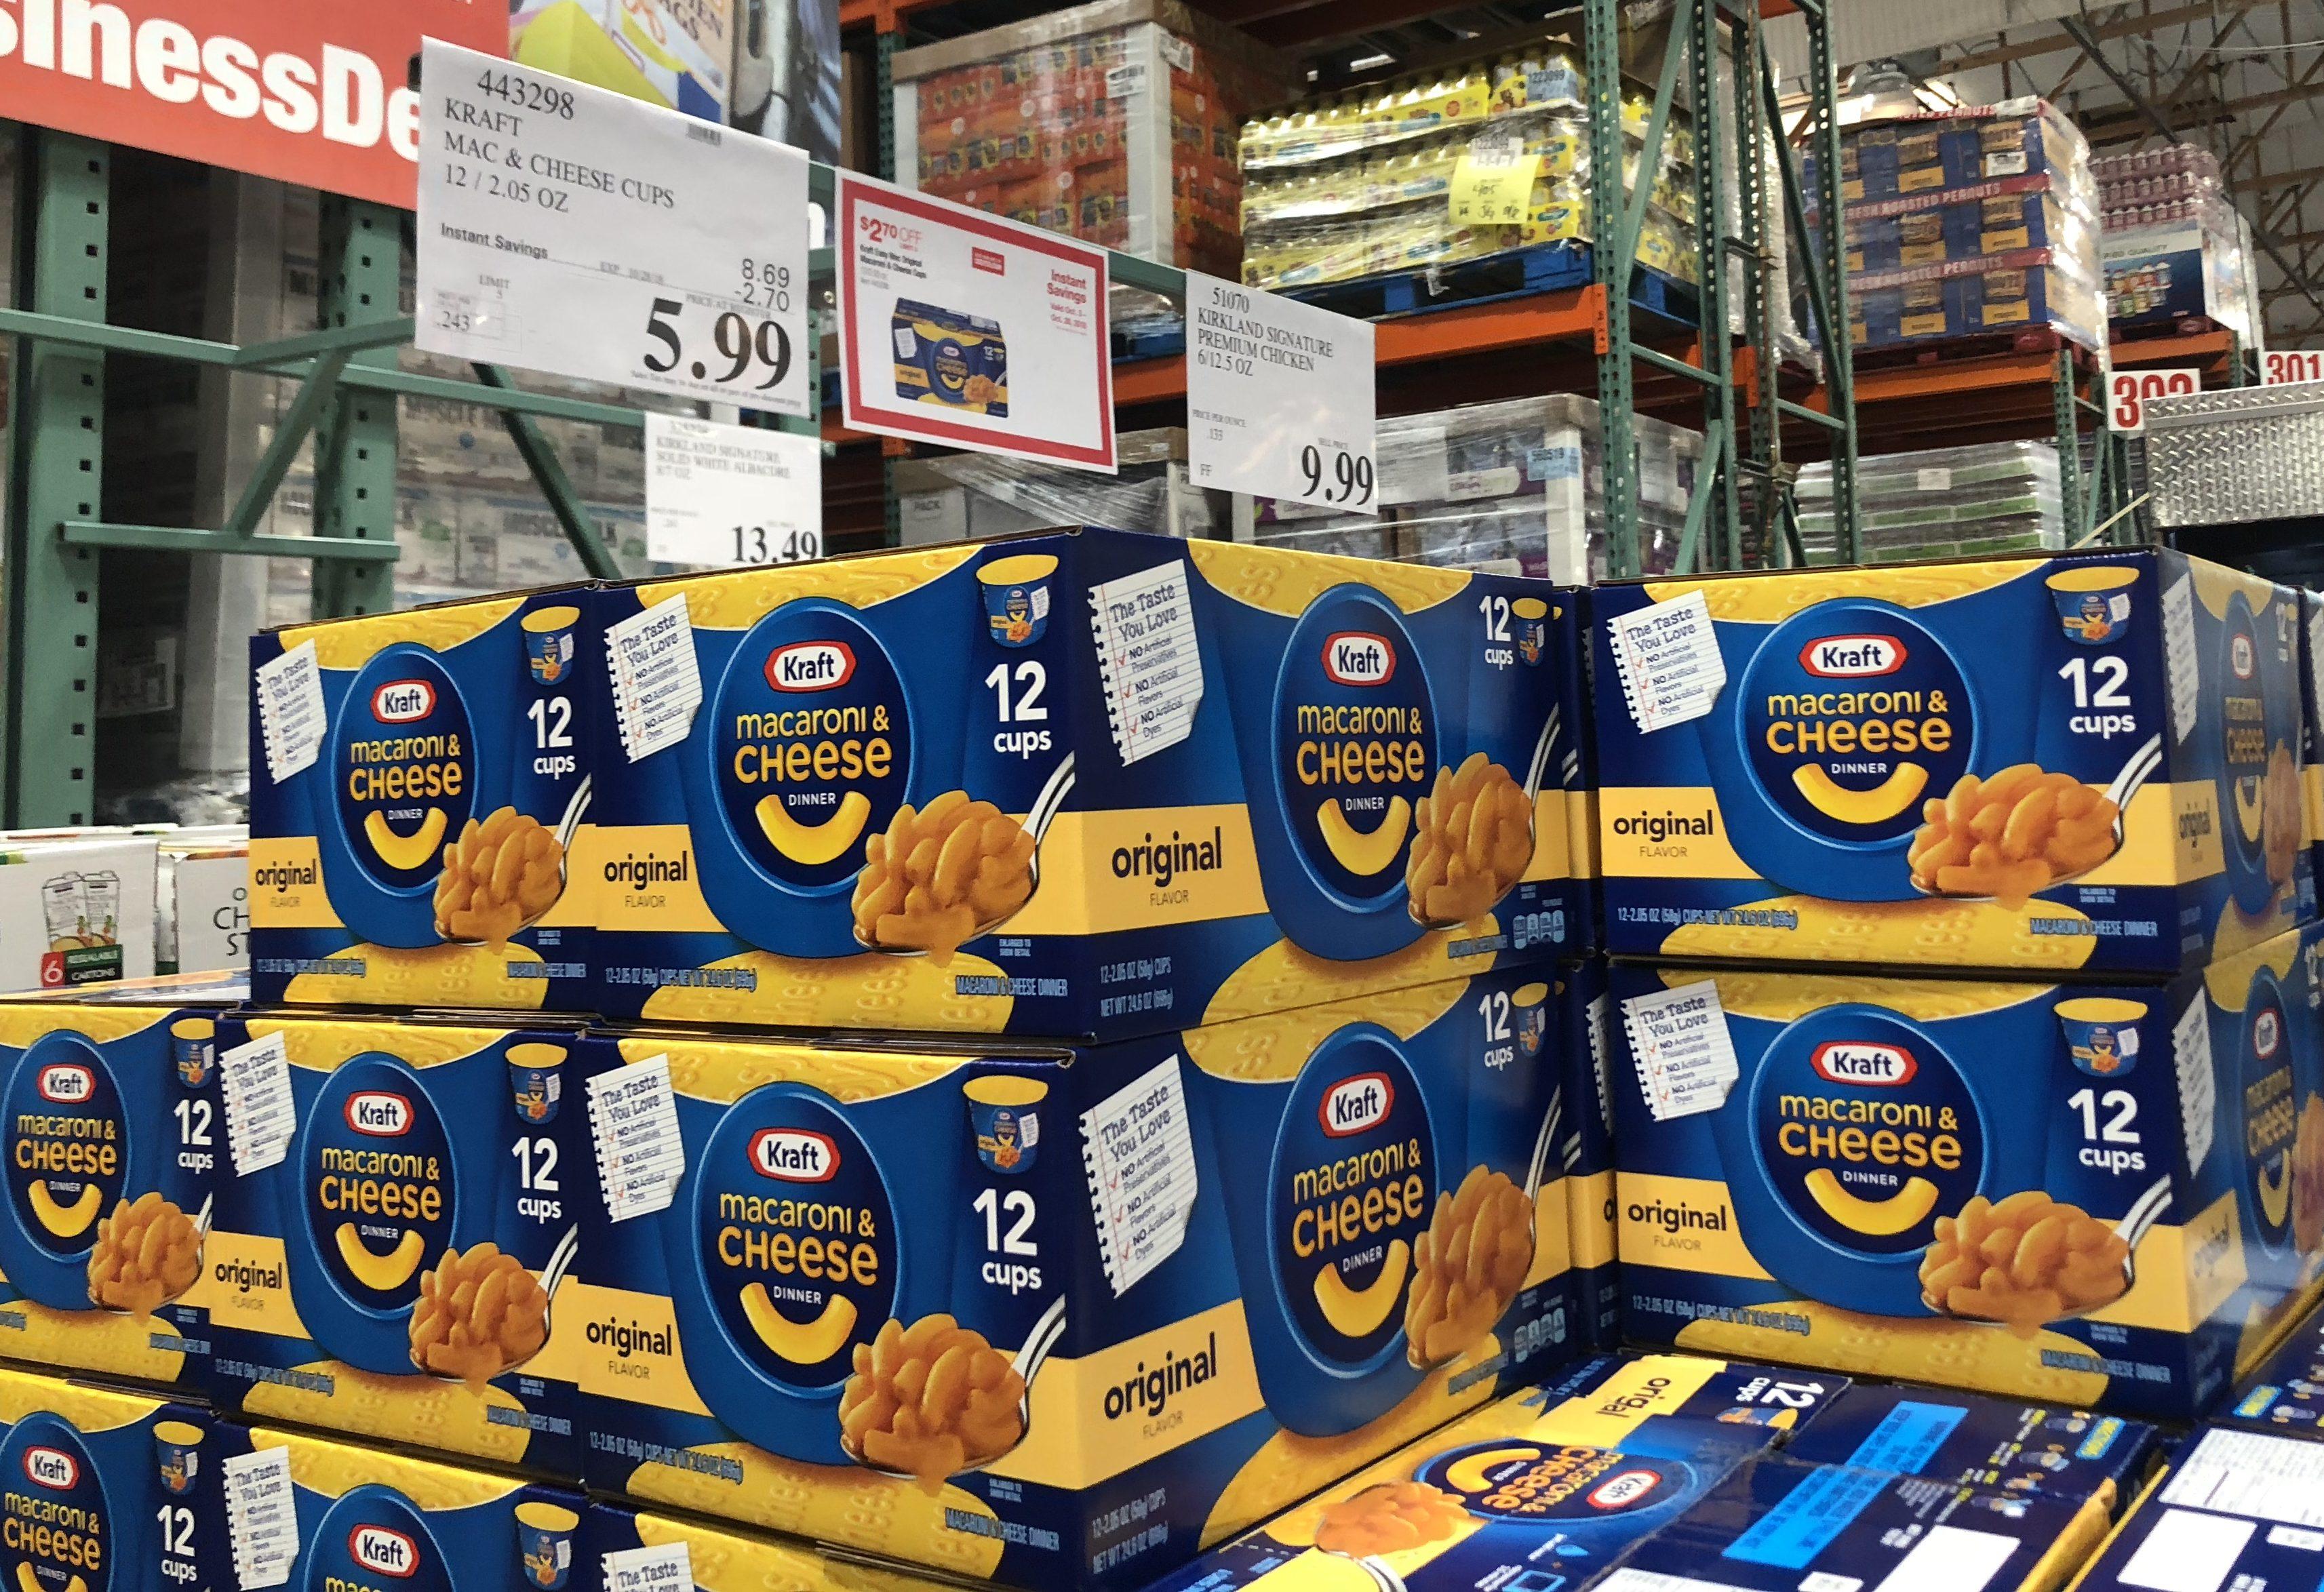 Costco deals October 2018 – Kraft mac and cheese cups Costco